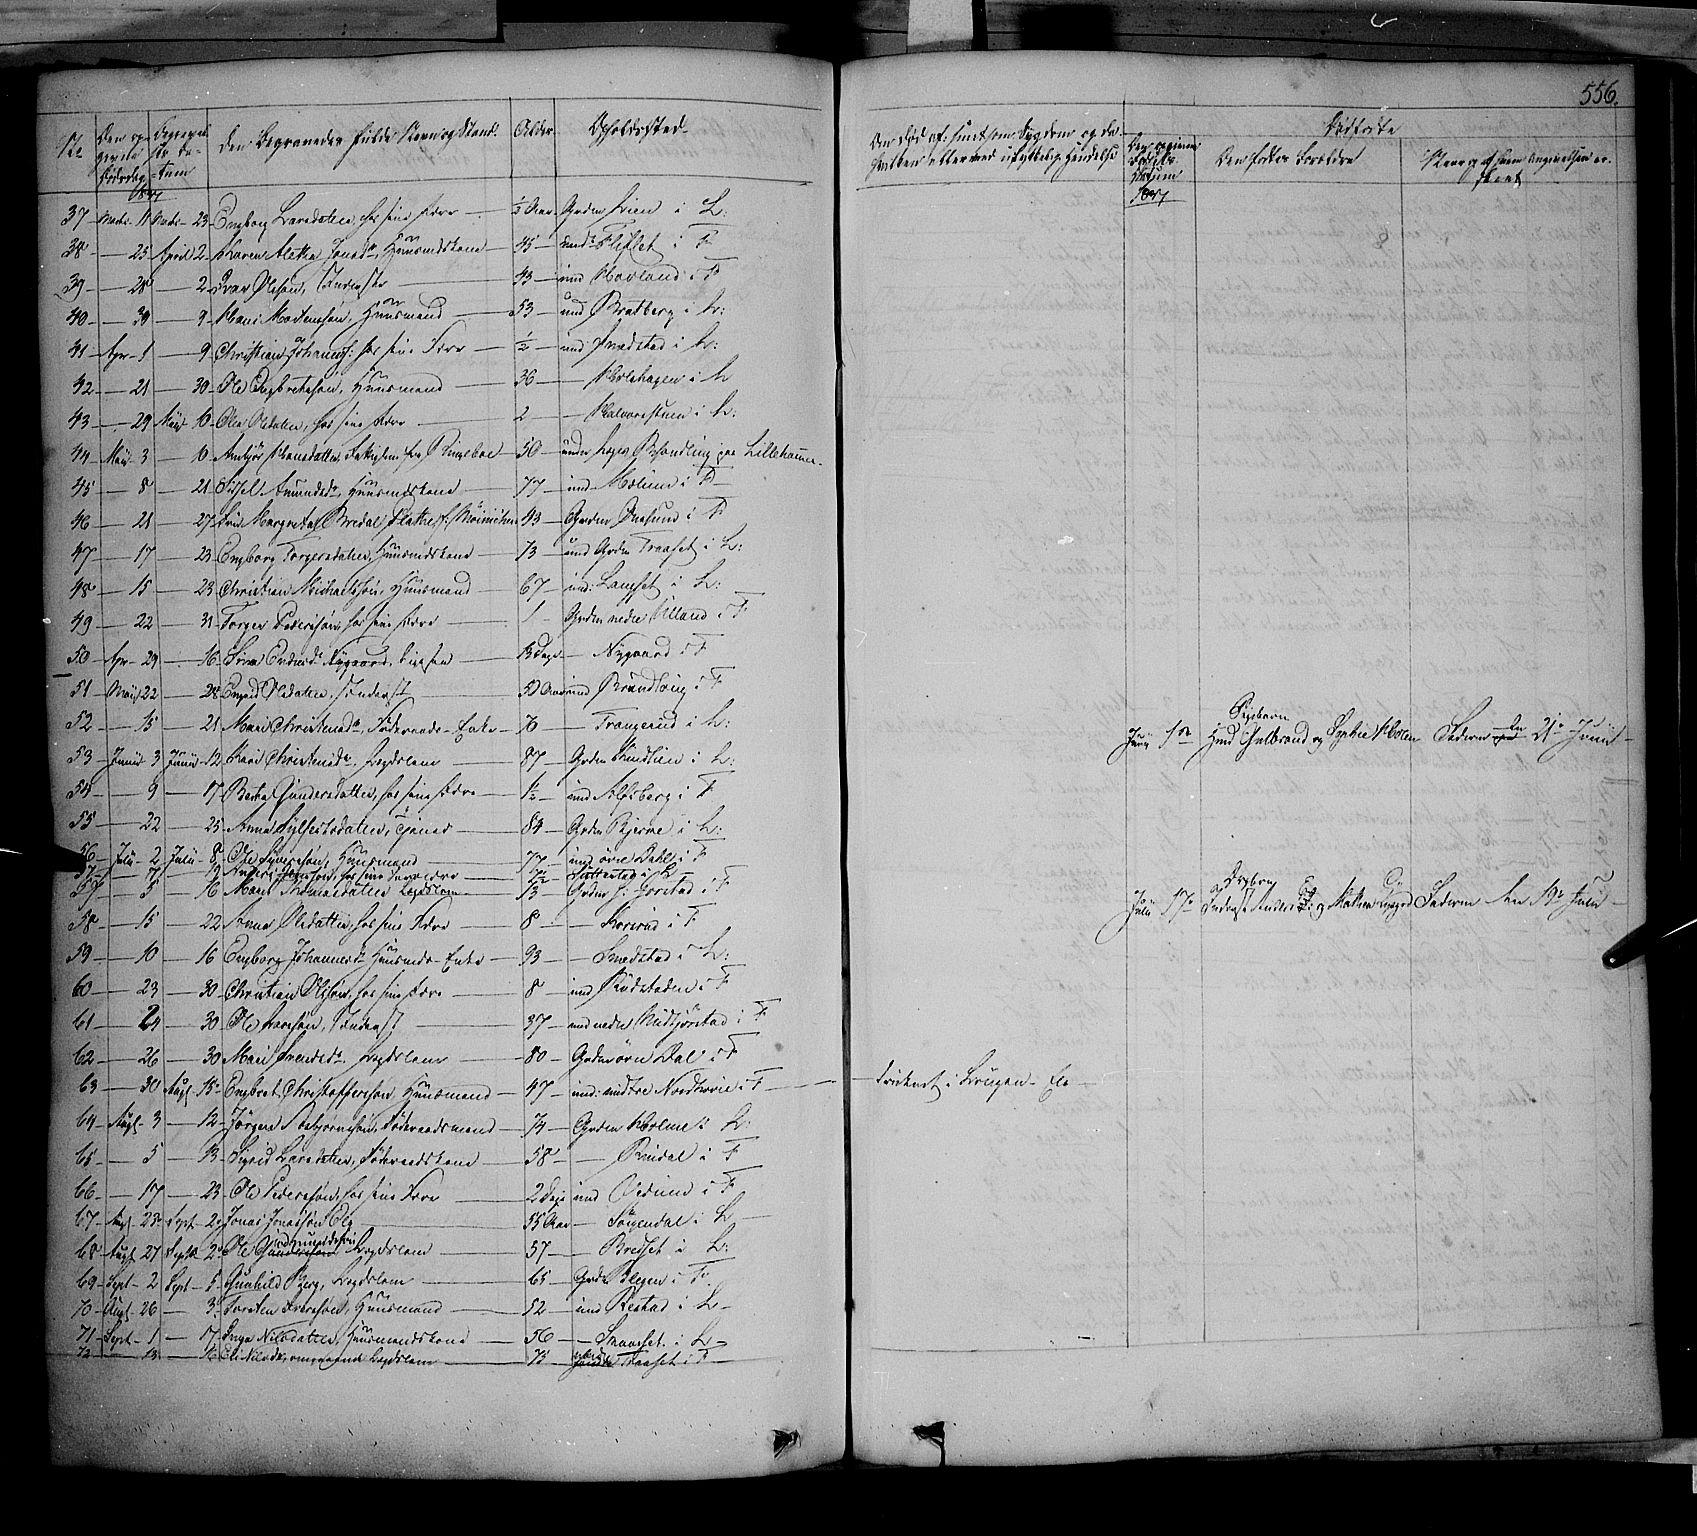 SAH, Fåberg prestekontor, Ministerialbok nr. 5, 1836-1854, s. 555-556